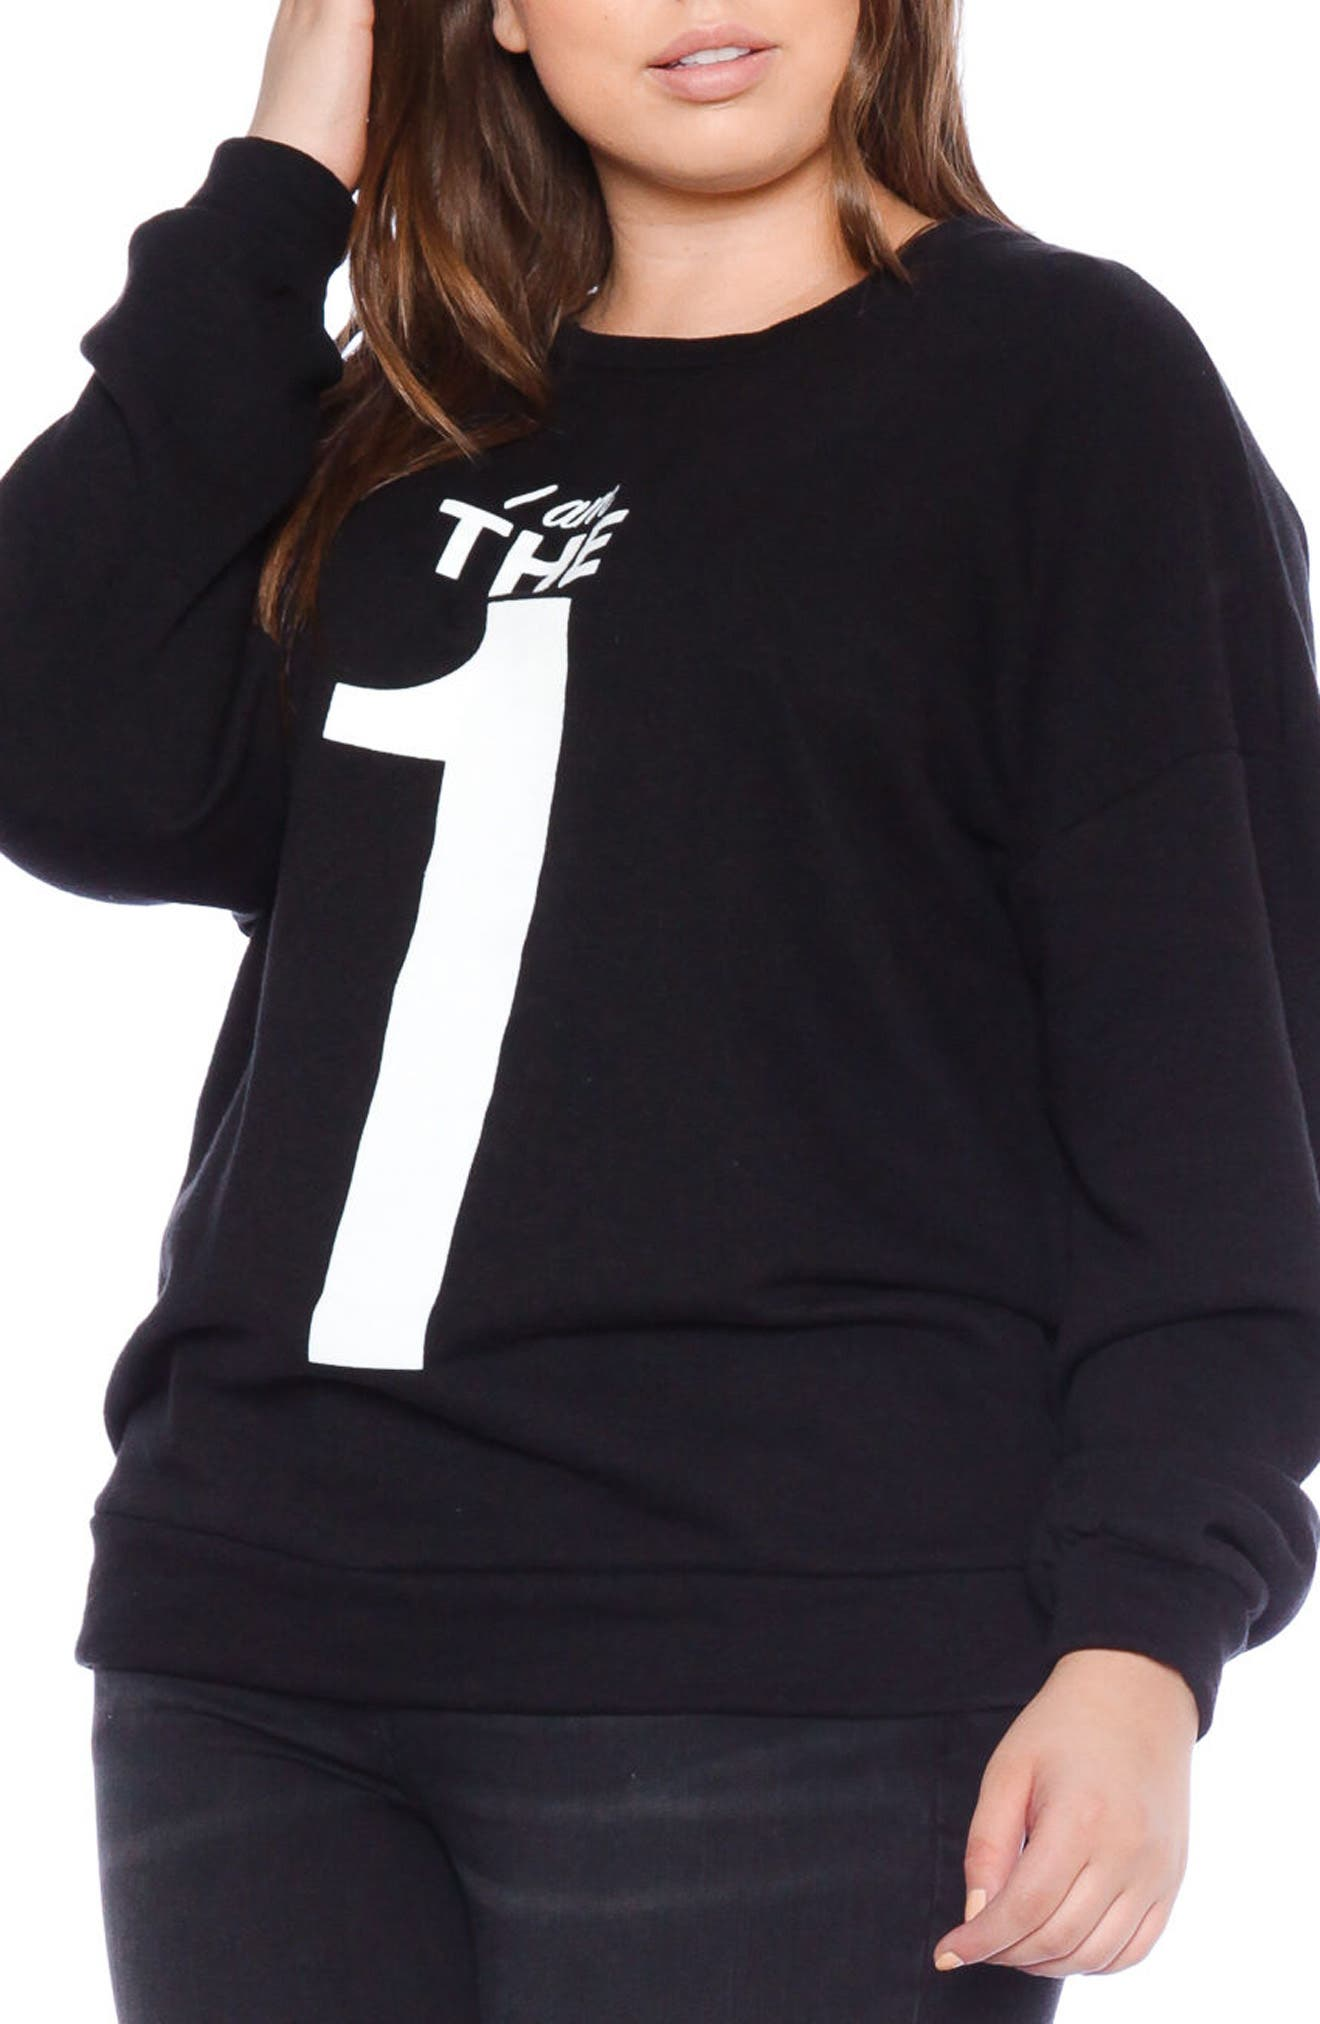 SLINK JEANS,                             I Am the One Oversize Sweatshirt,                             Alternate thumbnail 3, color,                             BLACK